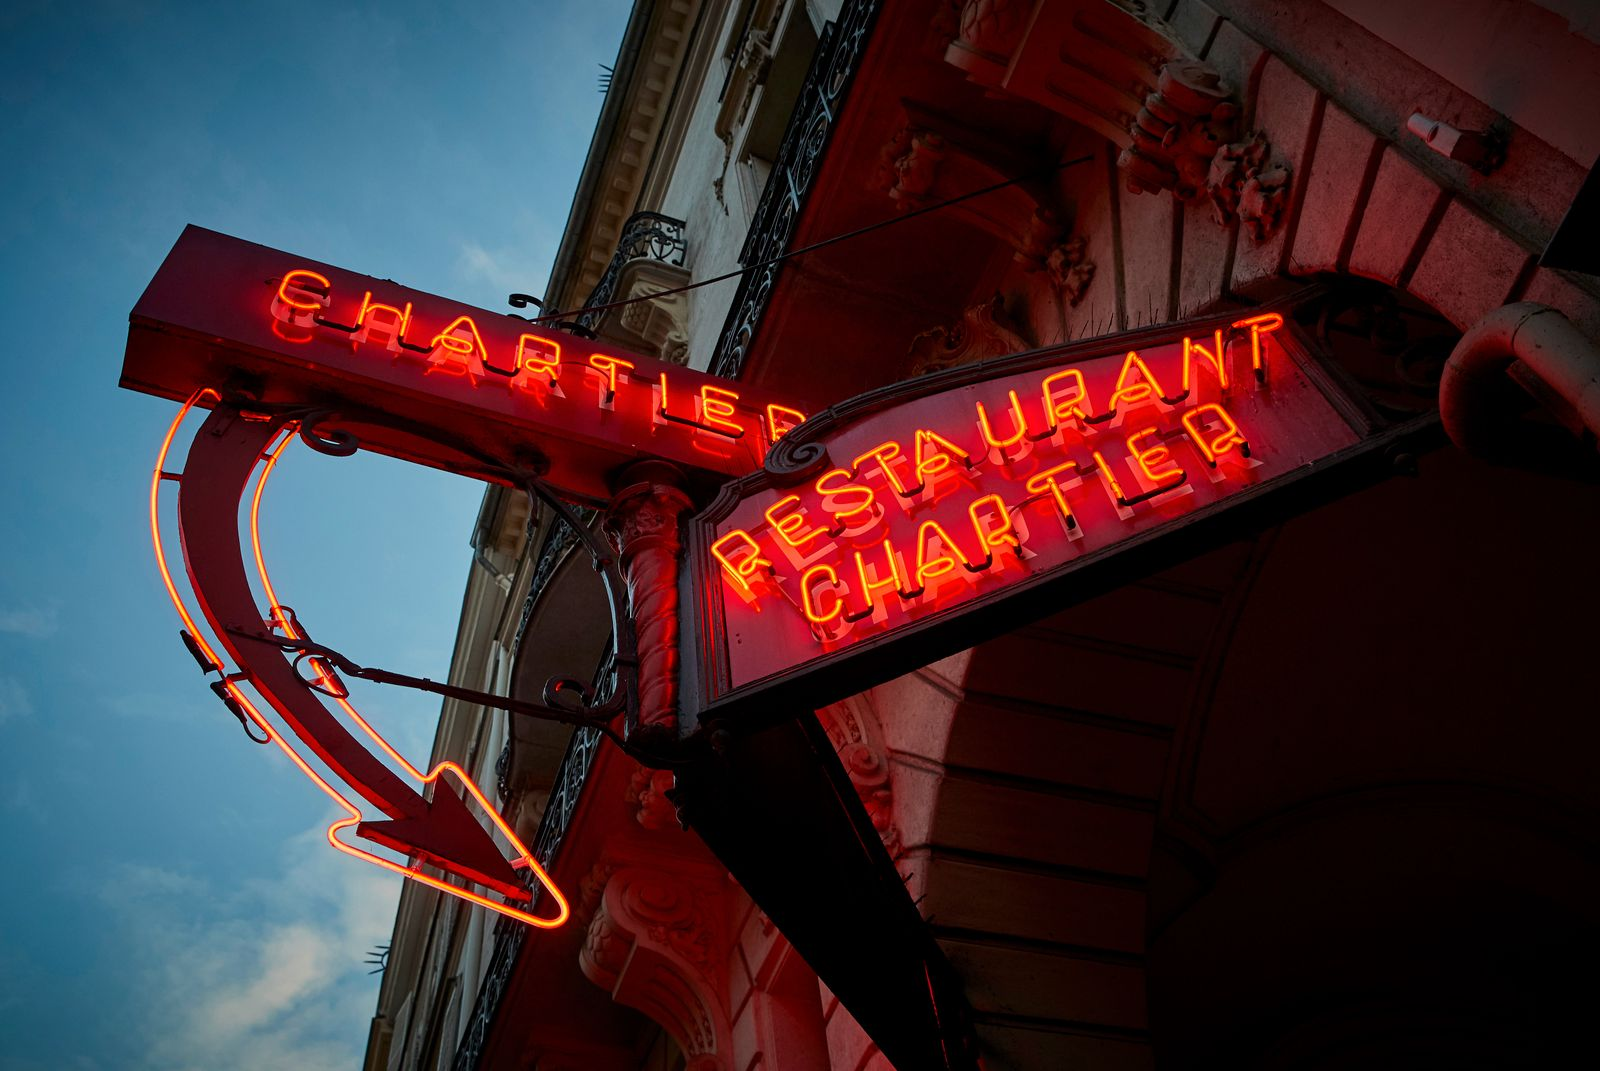 Chartier Bouillon Restaurant Coping With Coronavirus: 120 Years of Monumental Parisian Dinners